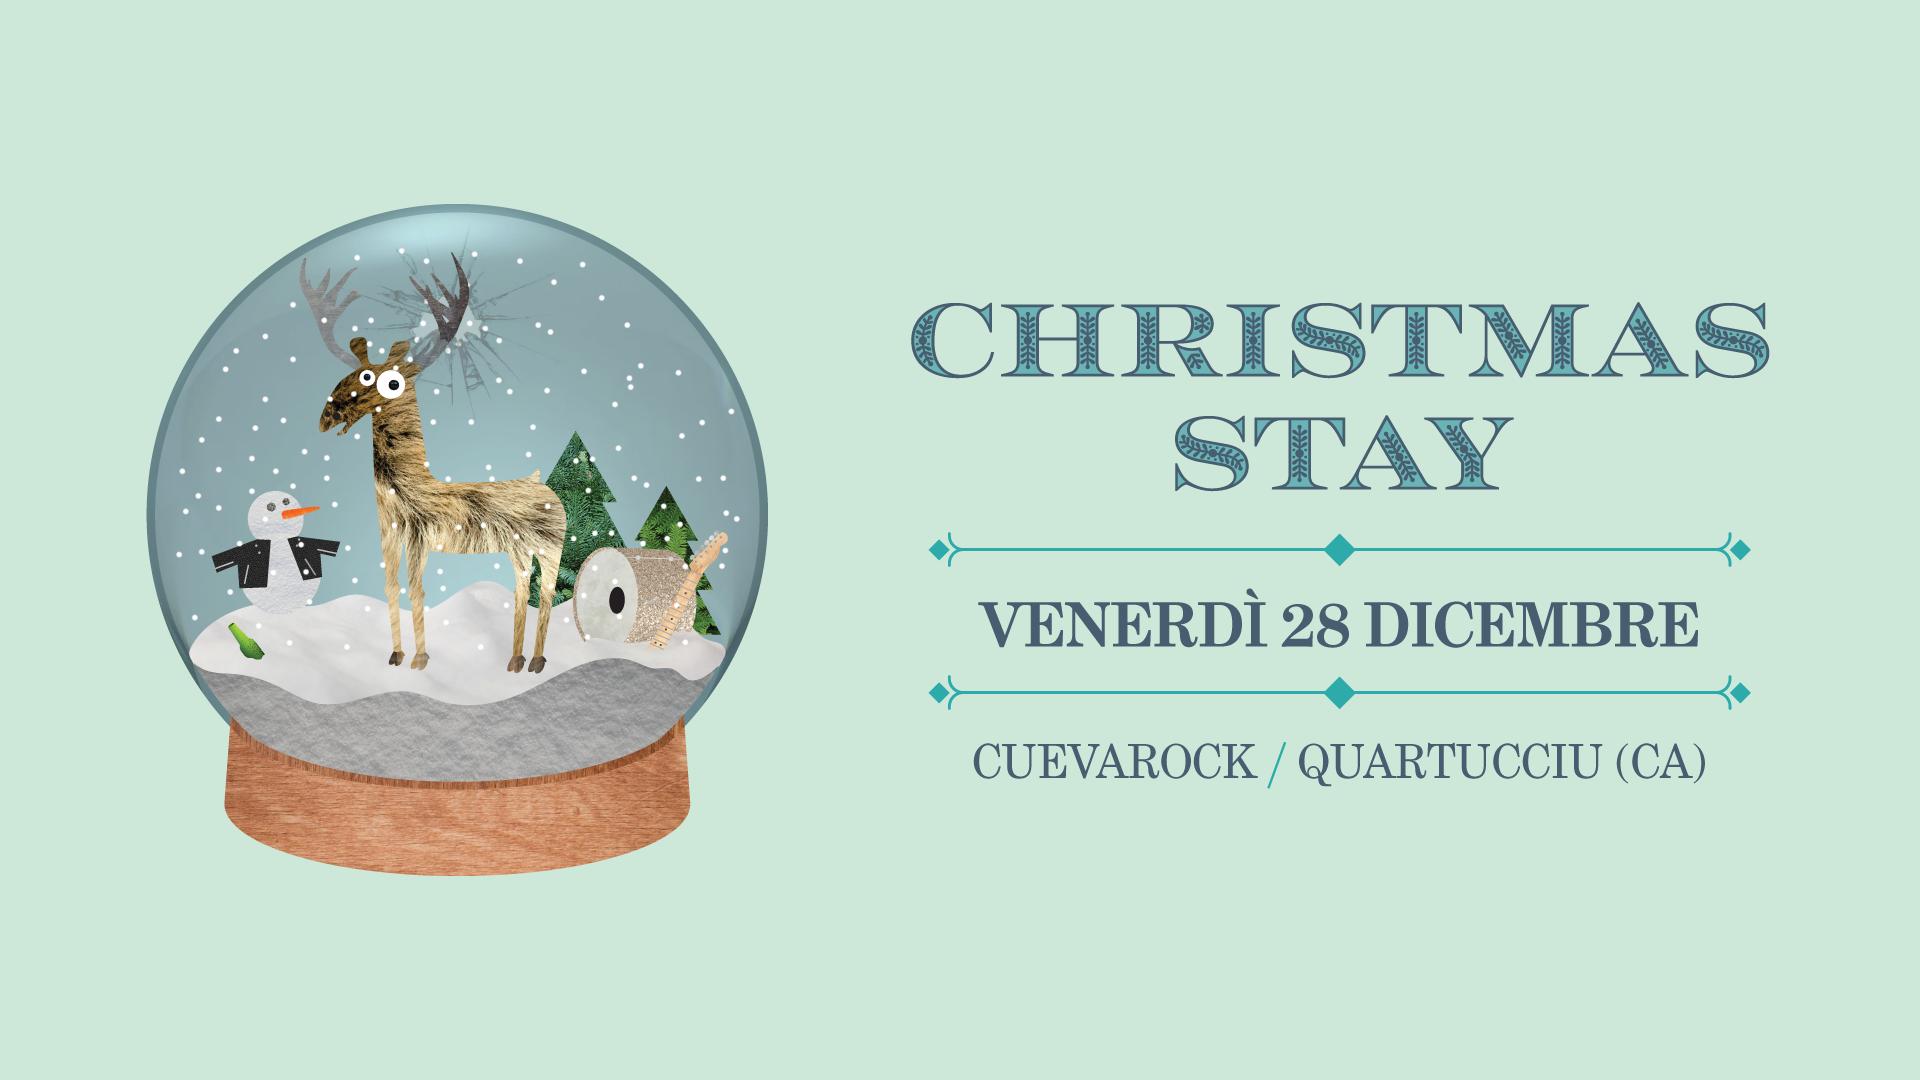 CHRISTMAS STAY 2018